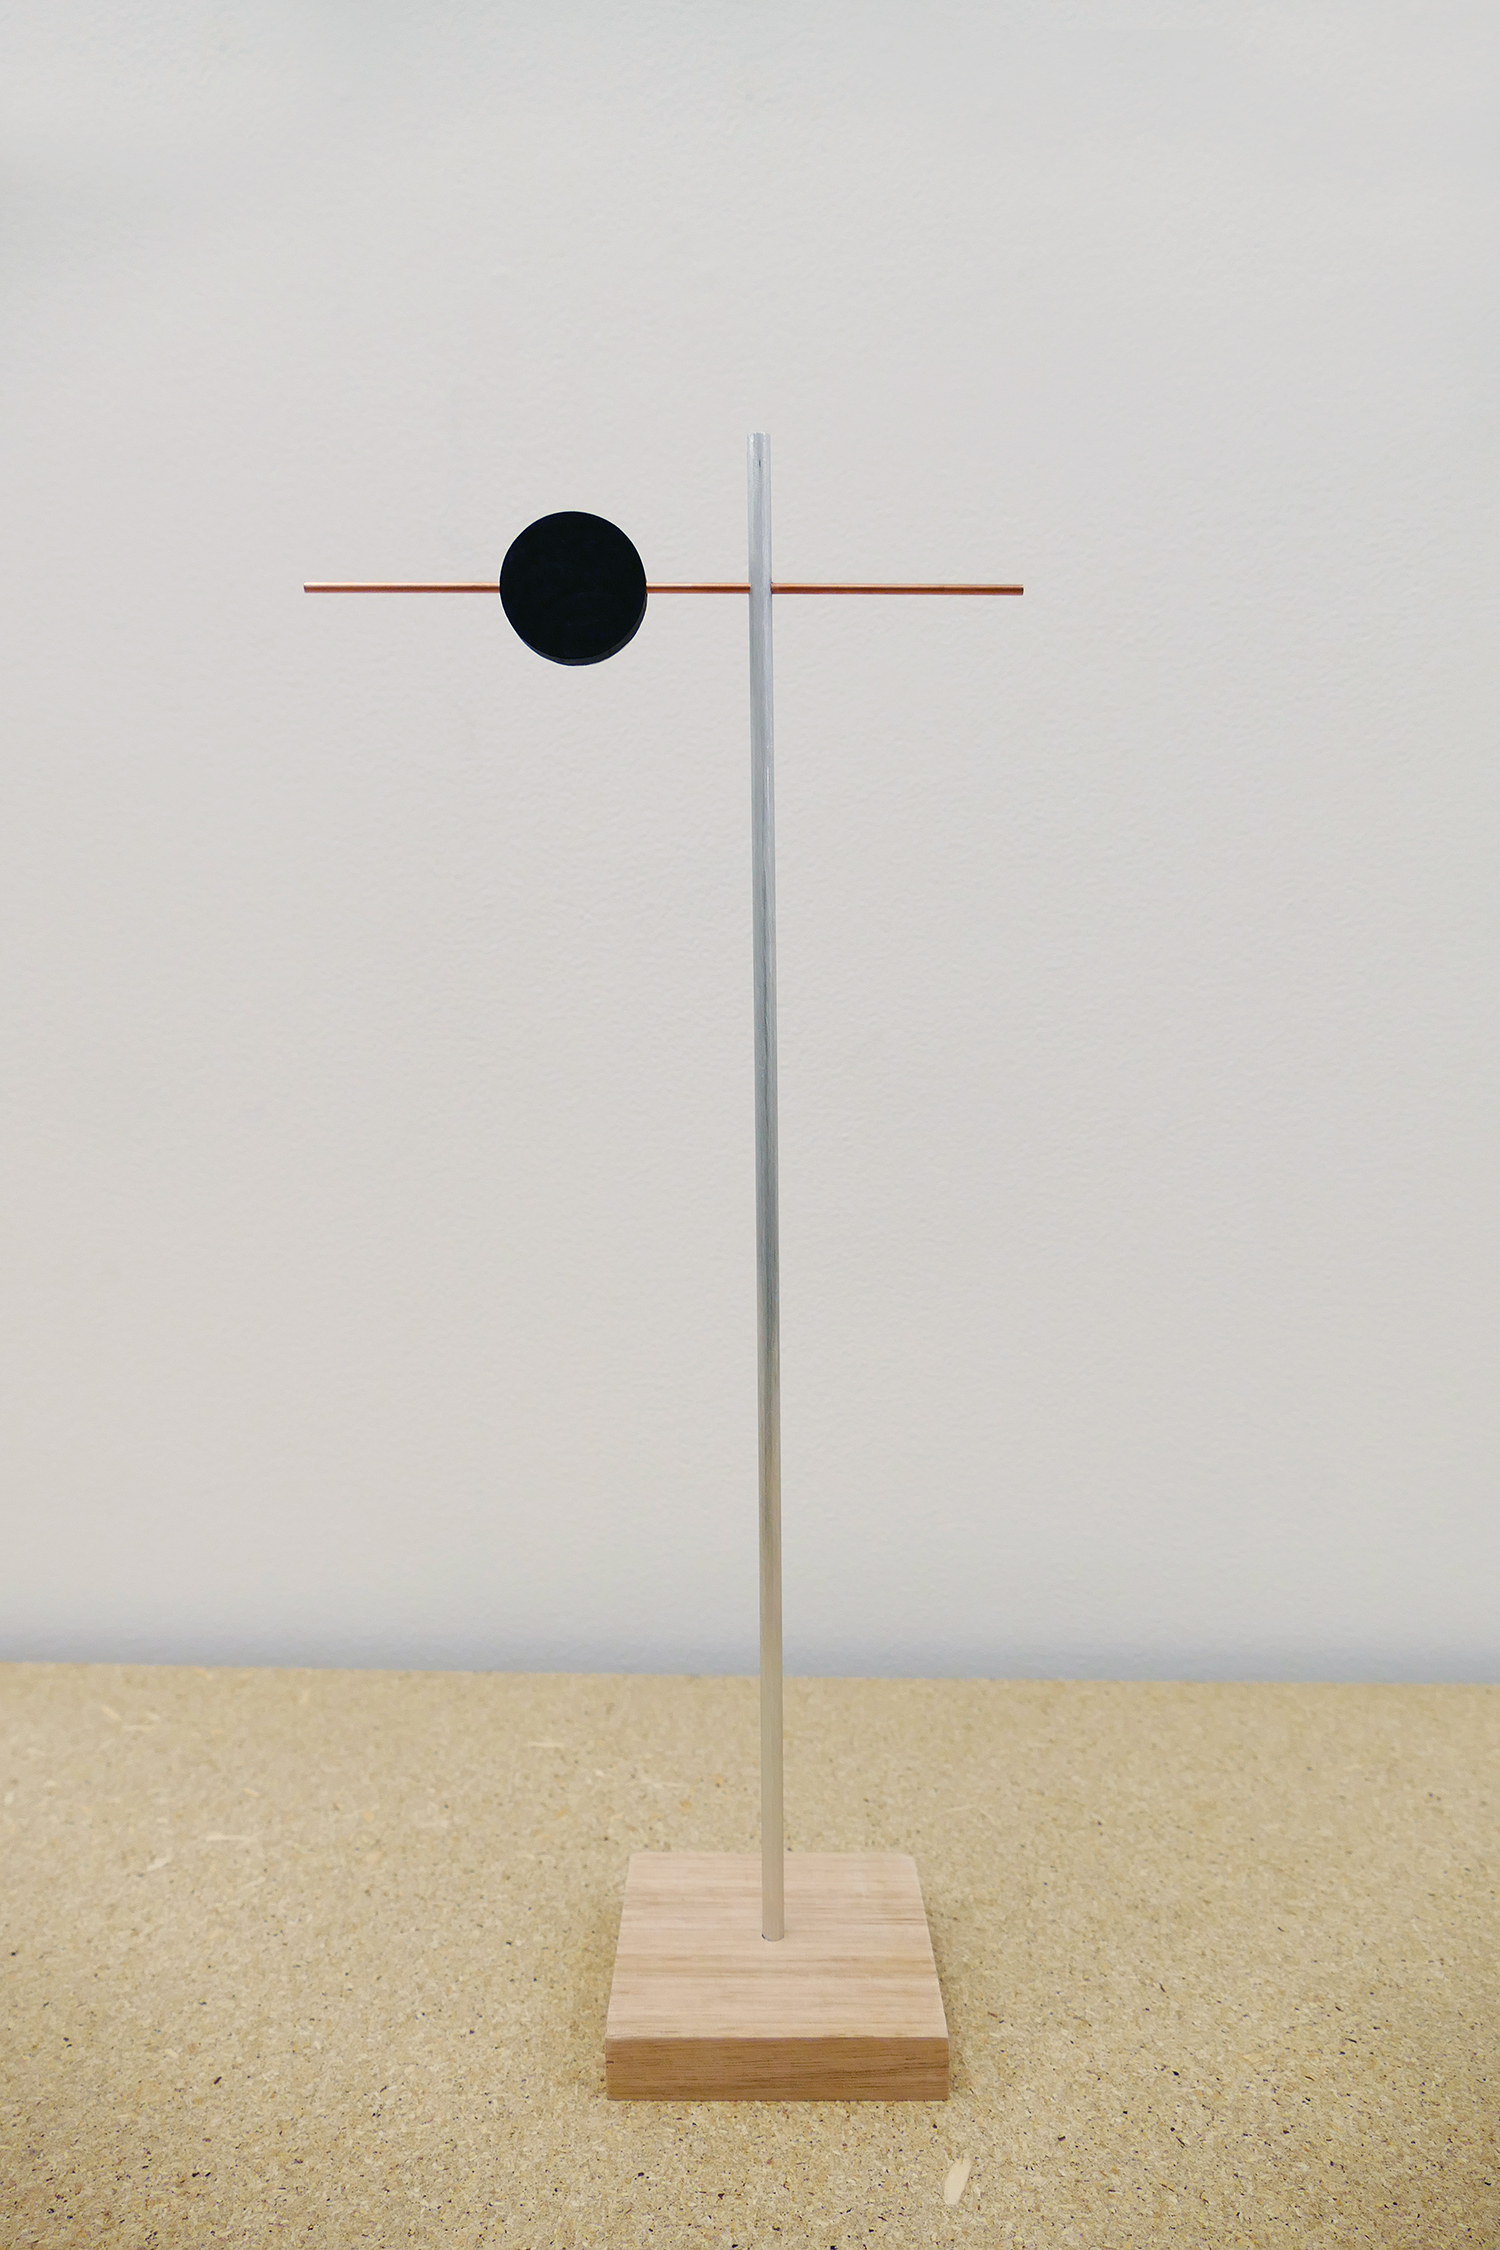 Hardbody Sculpture (Object) VI, 2017